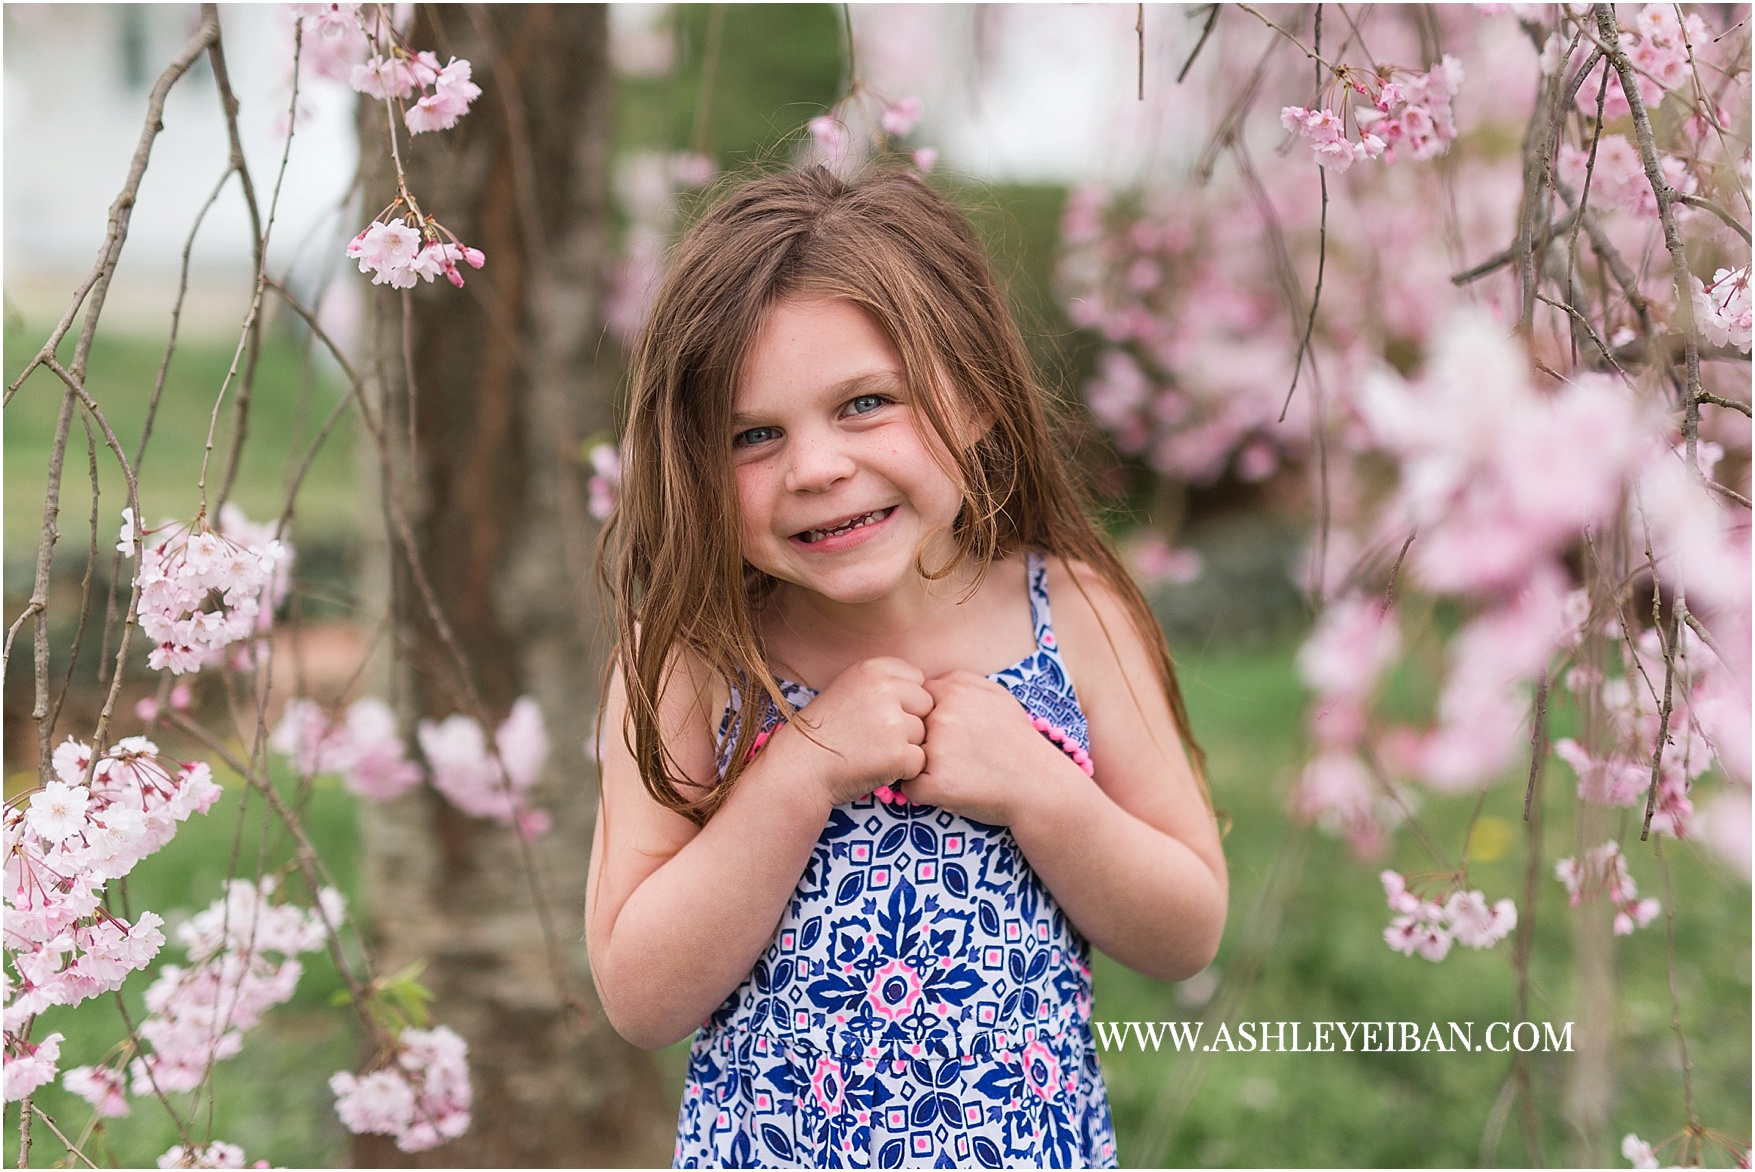 Lynchburg, VA Wedding and Family Photographer || Central VA Wedding Photographer || Lynchburg Family Photos || Ashley Eiban Photography || www.ashleyeiban.com